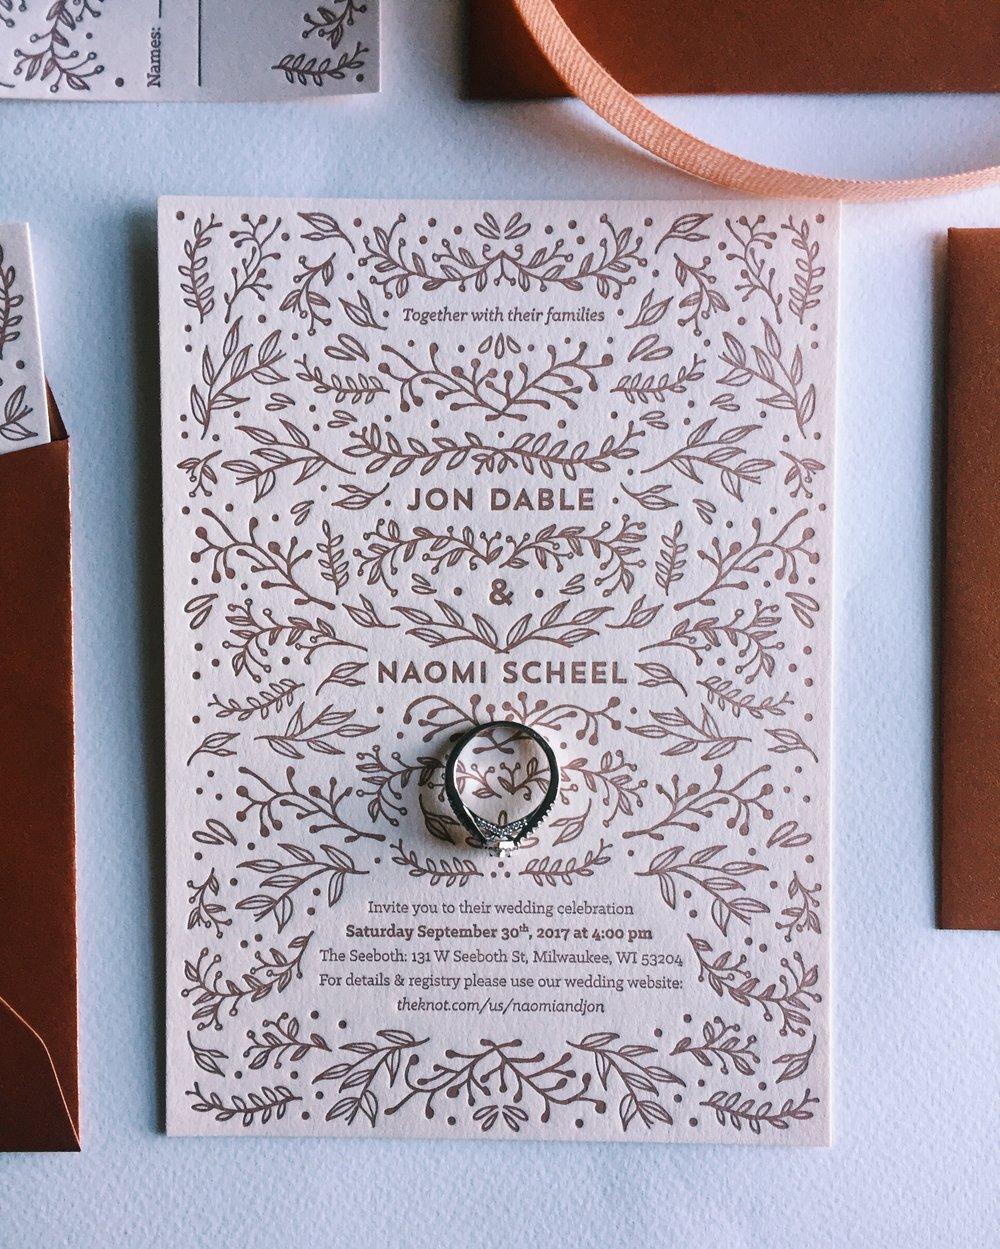 naomipaperco-wedding-invitation8.JPG